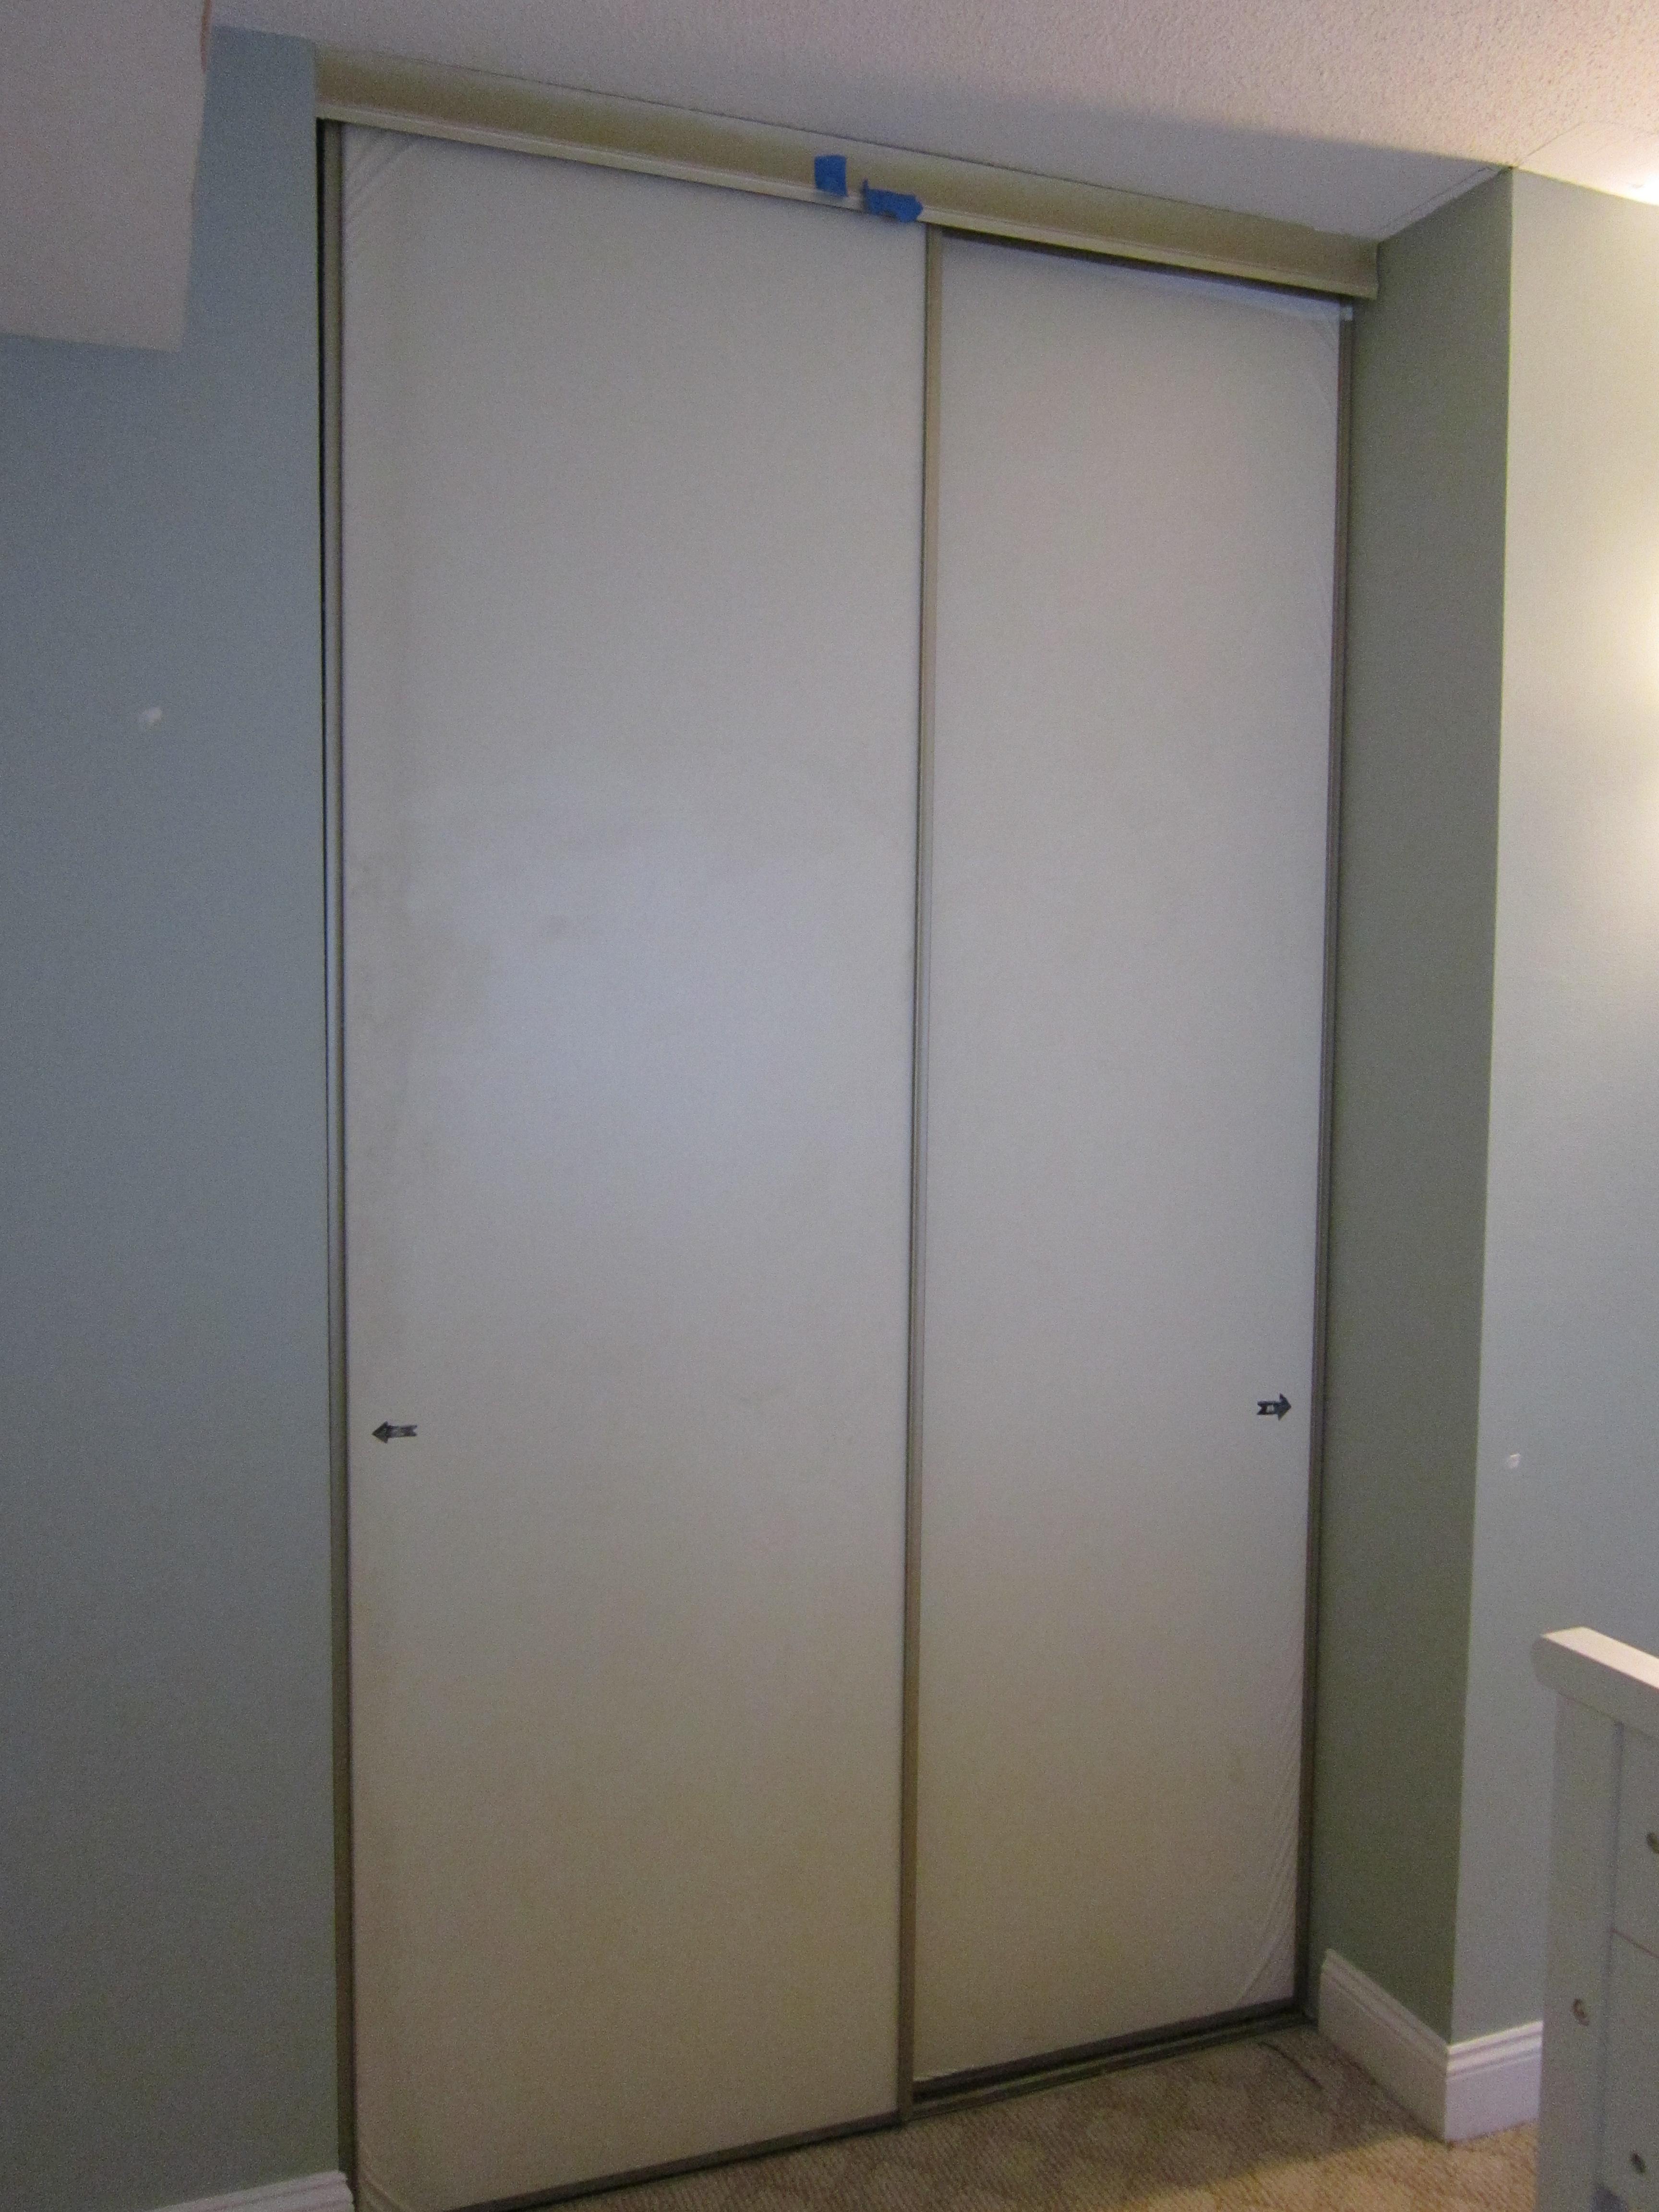 closet door knobs home depot photo - 11